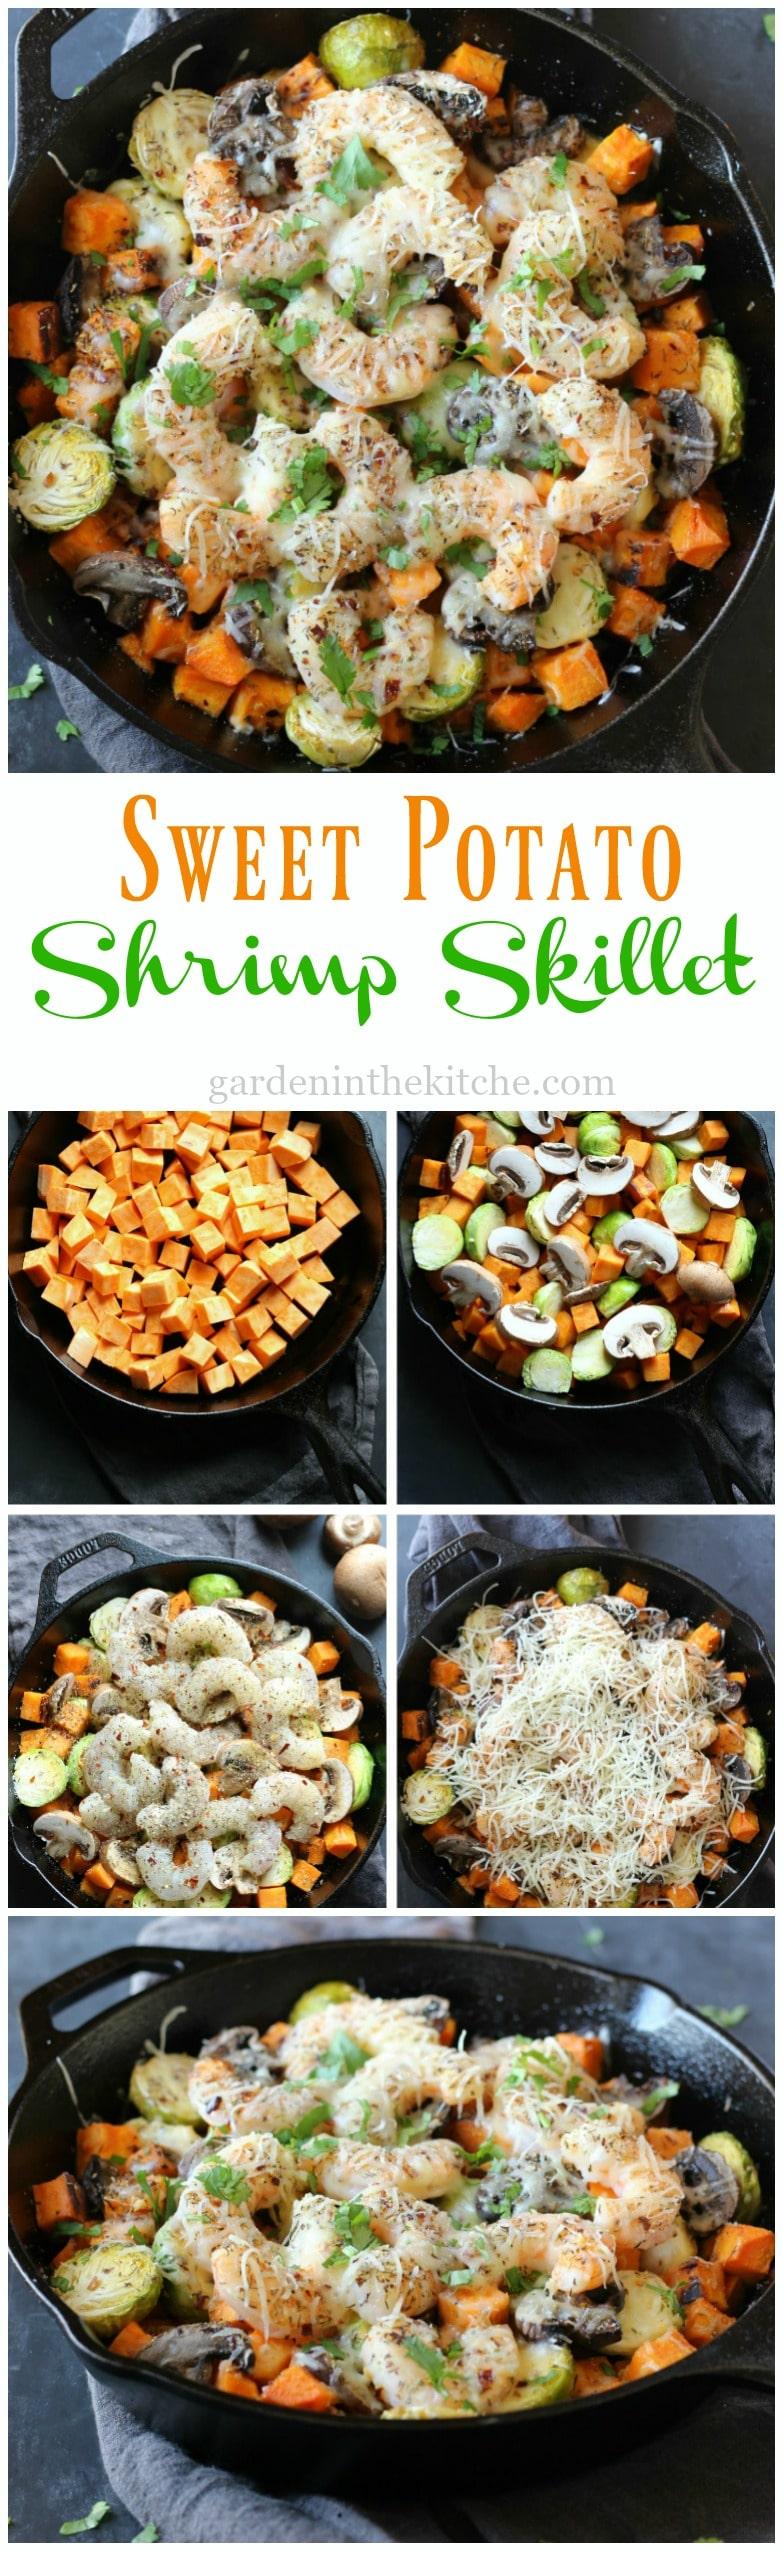 Sweet Potato Shrimp Skillet | gardeninthekitchen.com